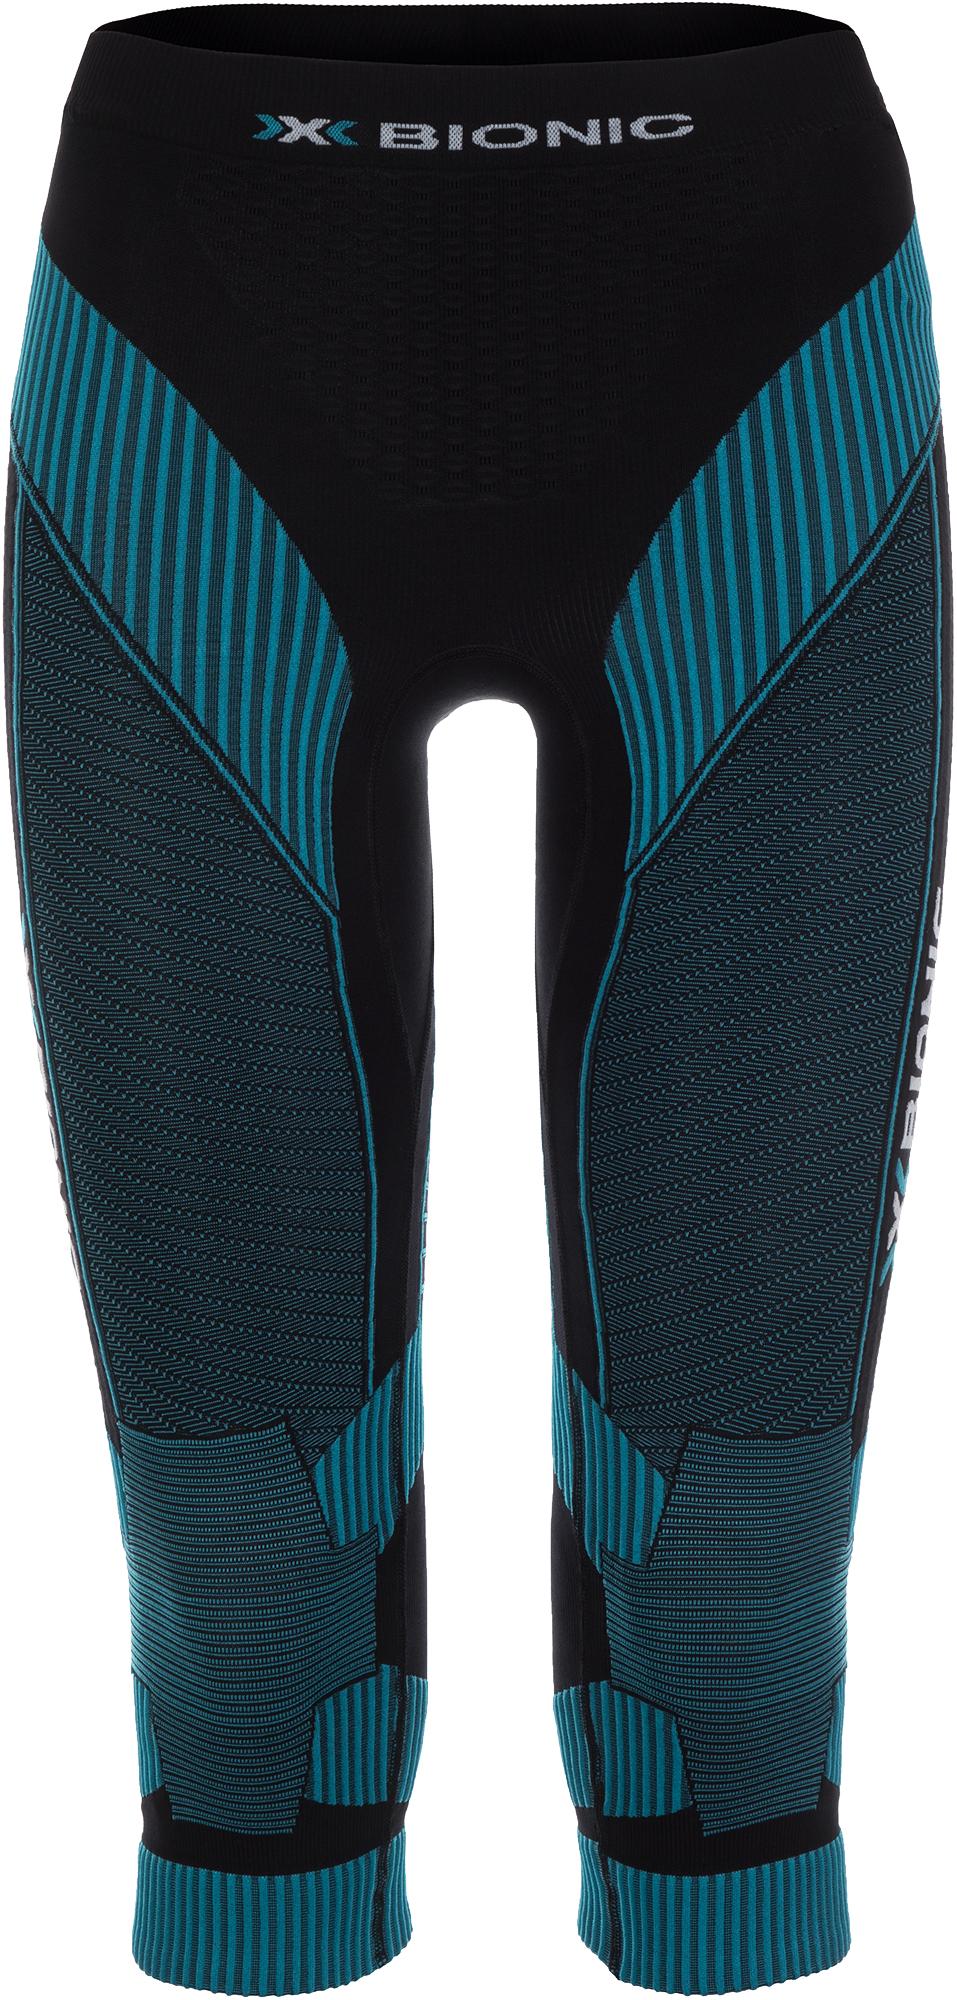 X-Bionic Бриджи женские X-Bionic Effector Power Ow, размер 48 футболка x bionic x bionic effektor running powershirt®